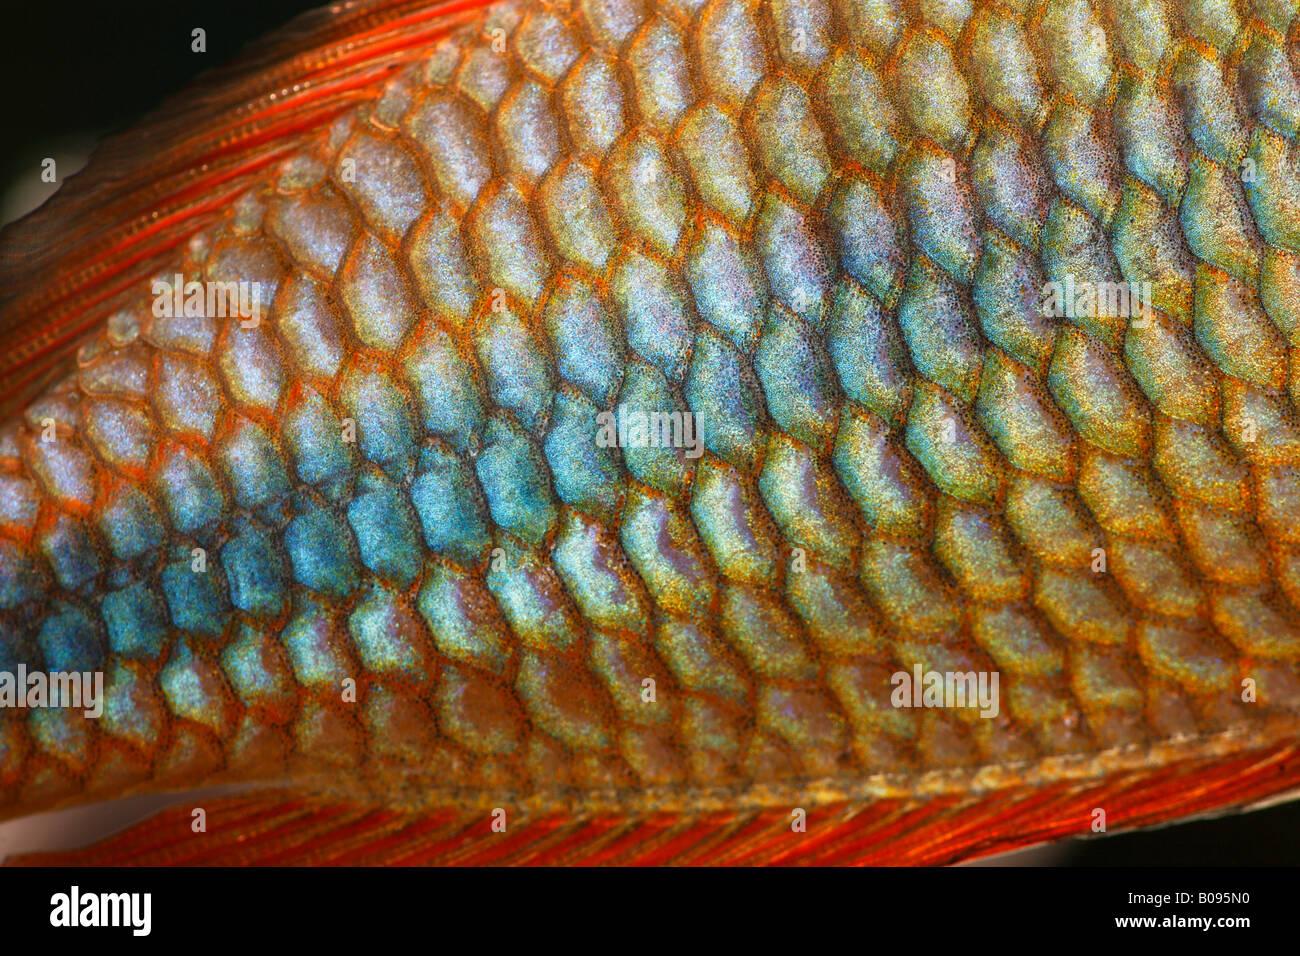 Freshwater fish in australia - Detail Scales Goyder River Or Banded Rainbow Fish Melanotaenia Trifasciata Native To Australia Warm Water Freshwater Aq